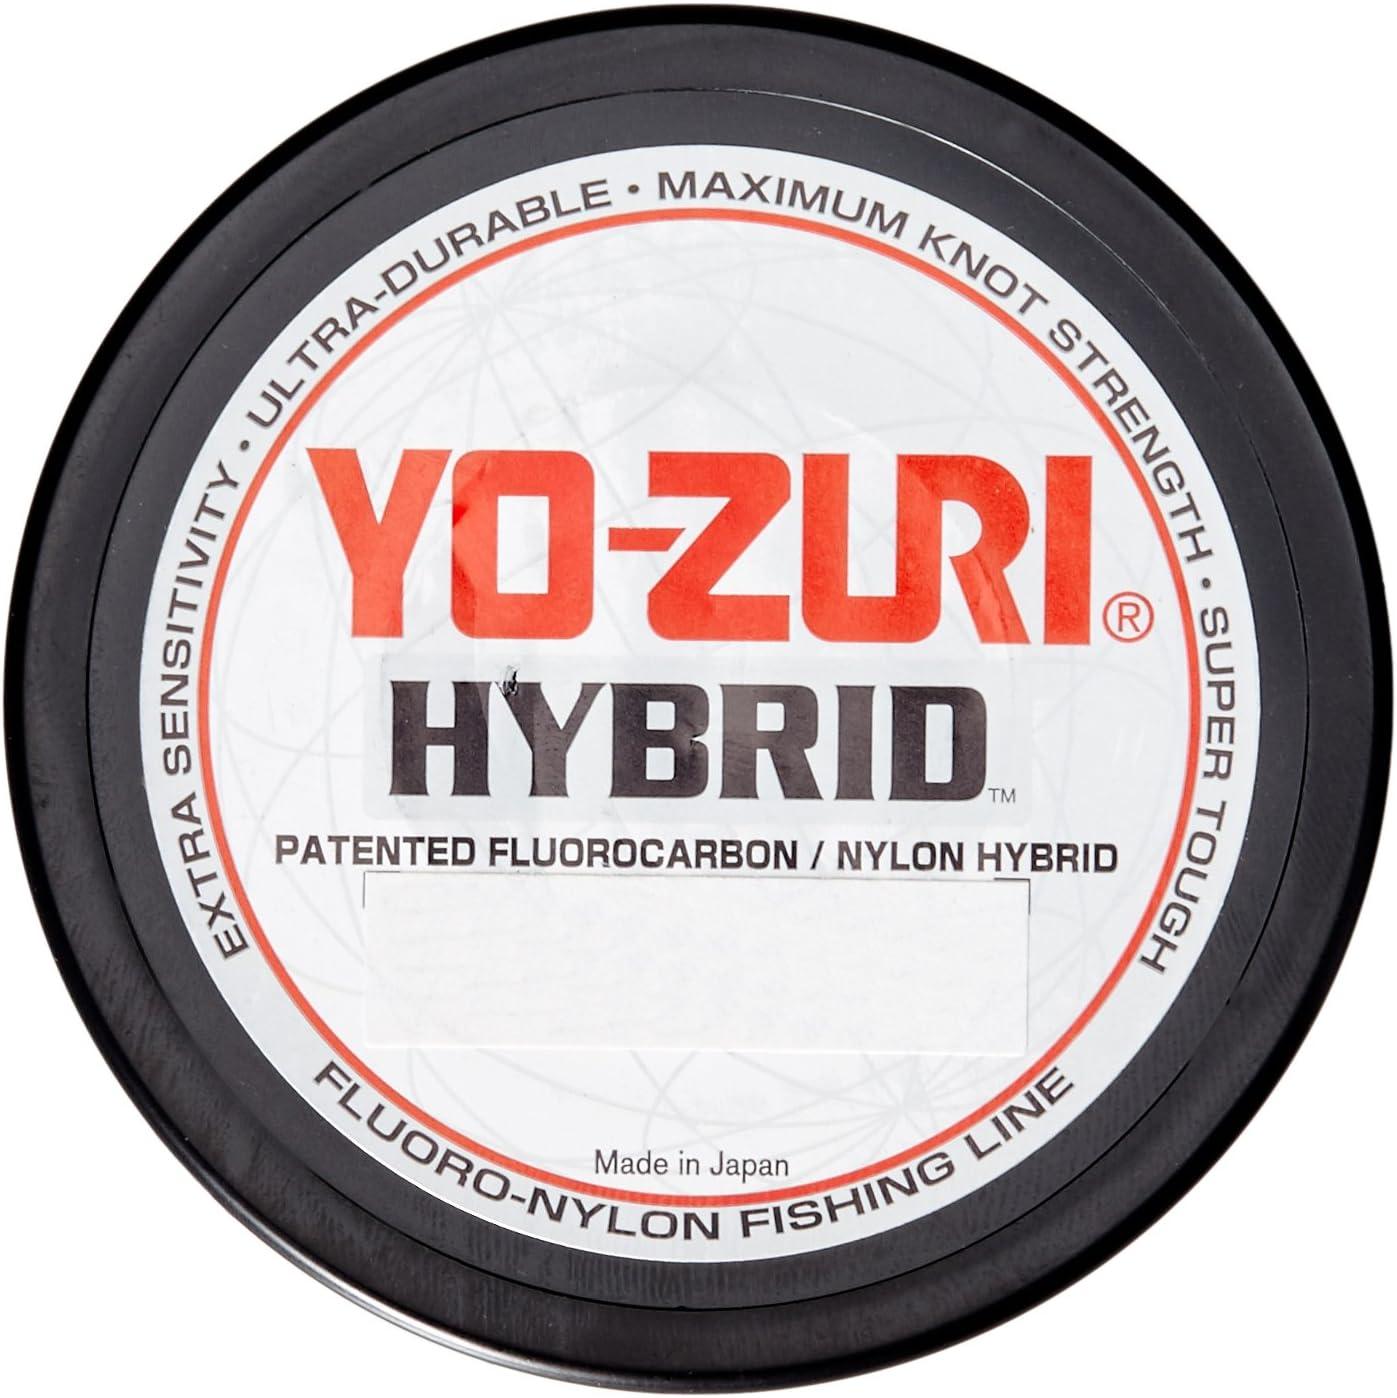 Yo-Zuri Hybrid 600-Yard Fishing Line